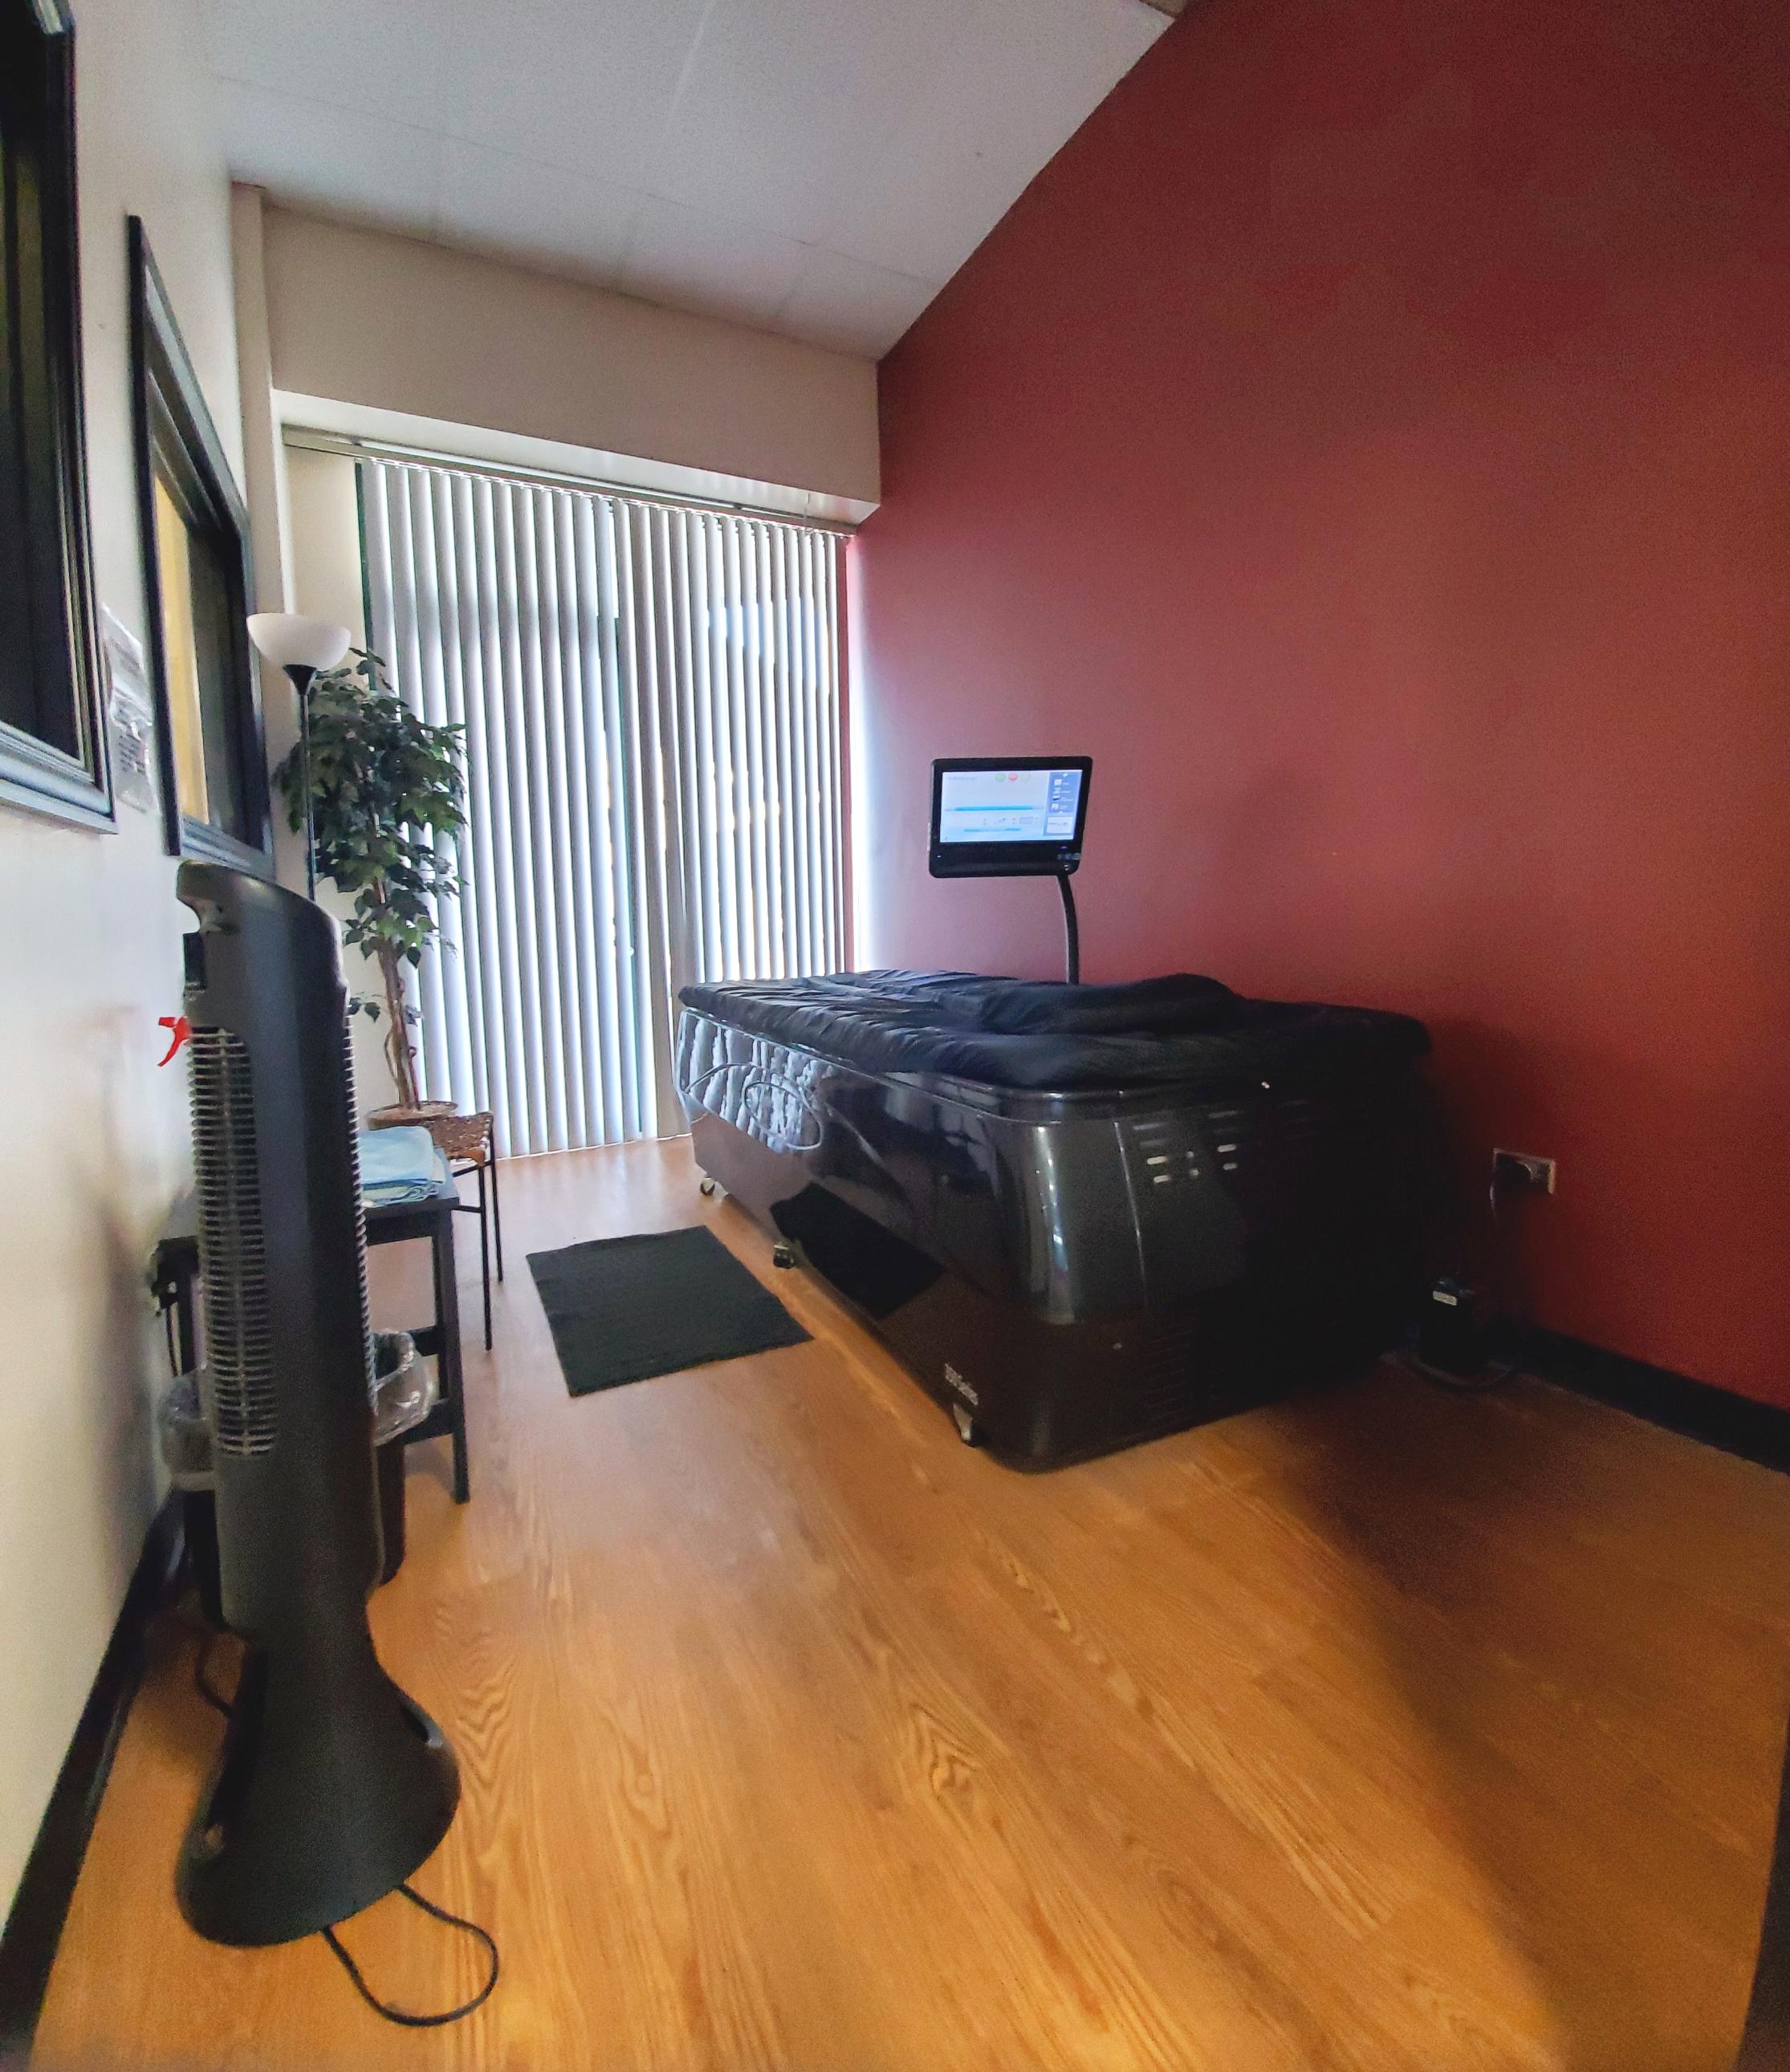 Hydro Massage Bed